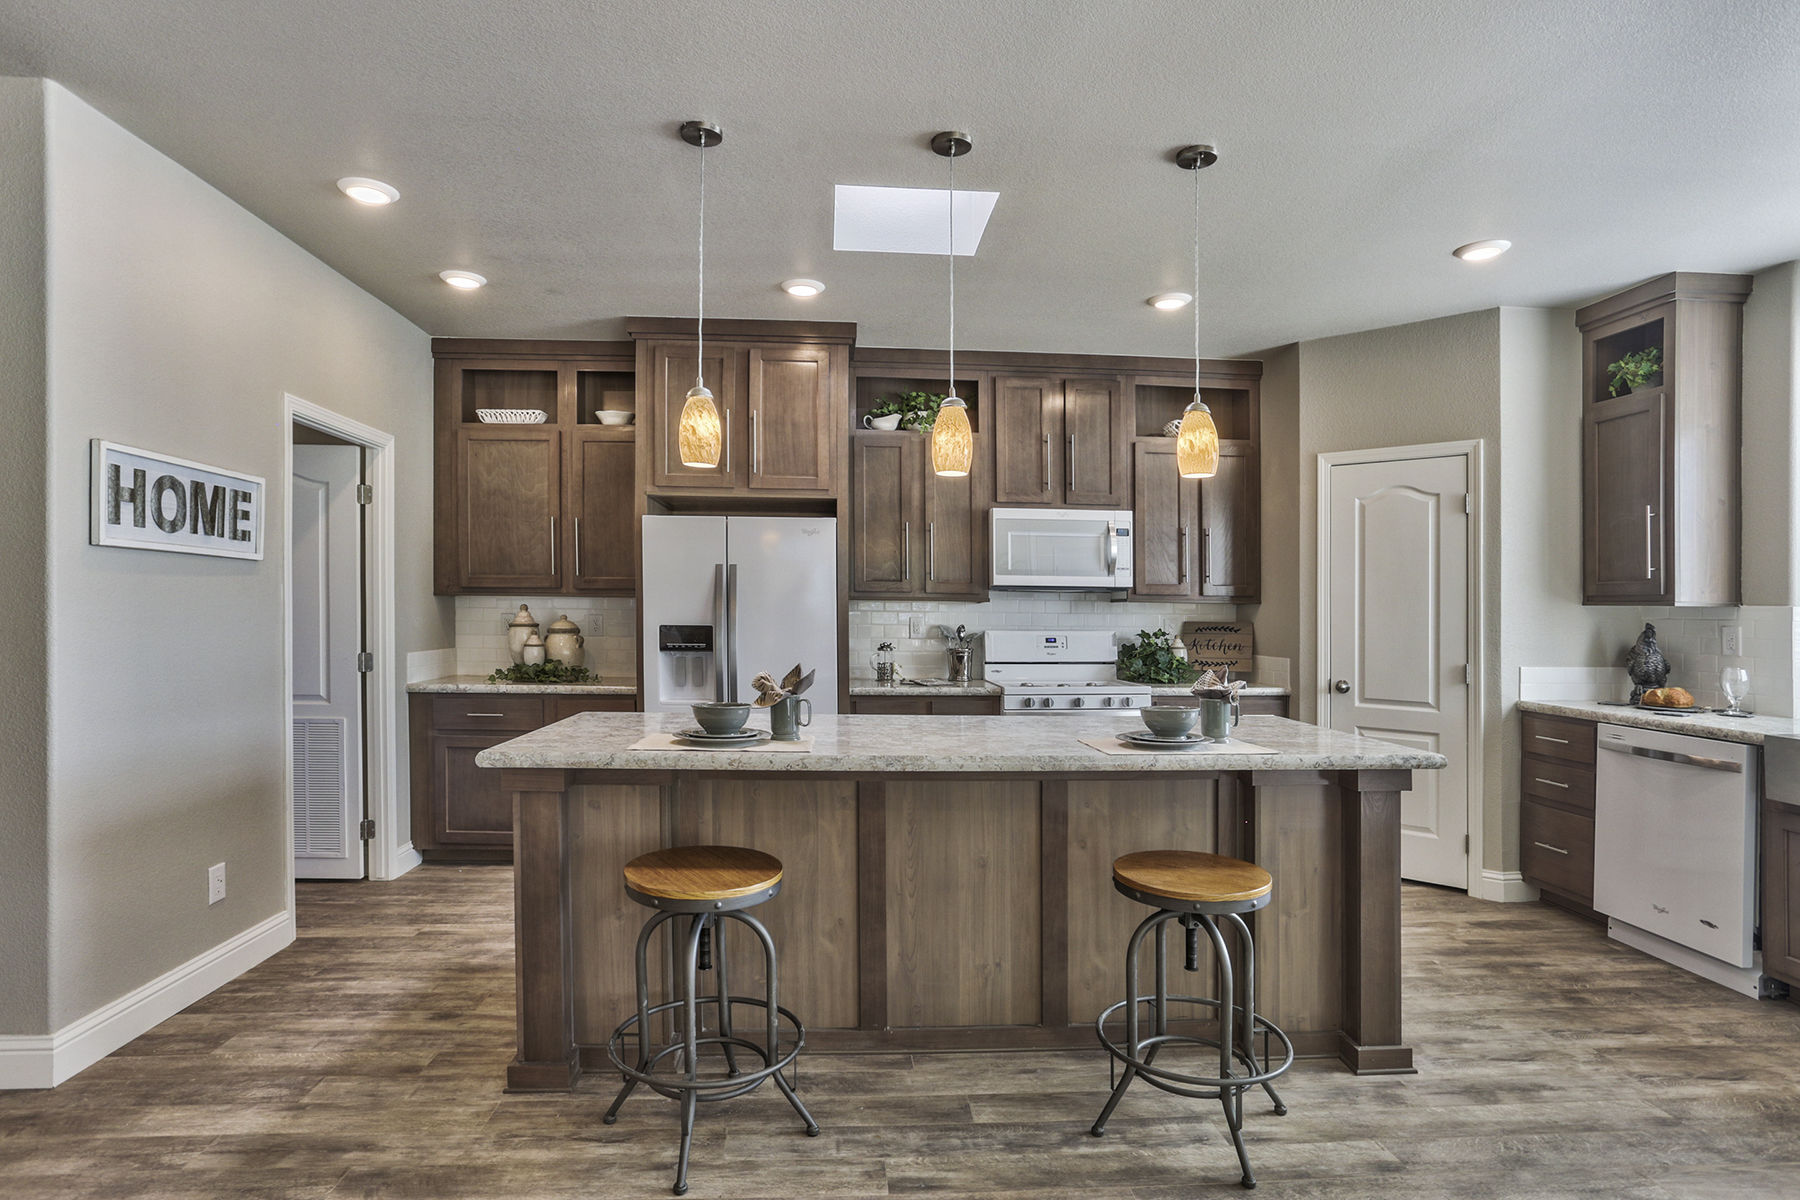 Champion Arizona 3 Bedroom Manufactured Home Skyland for